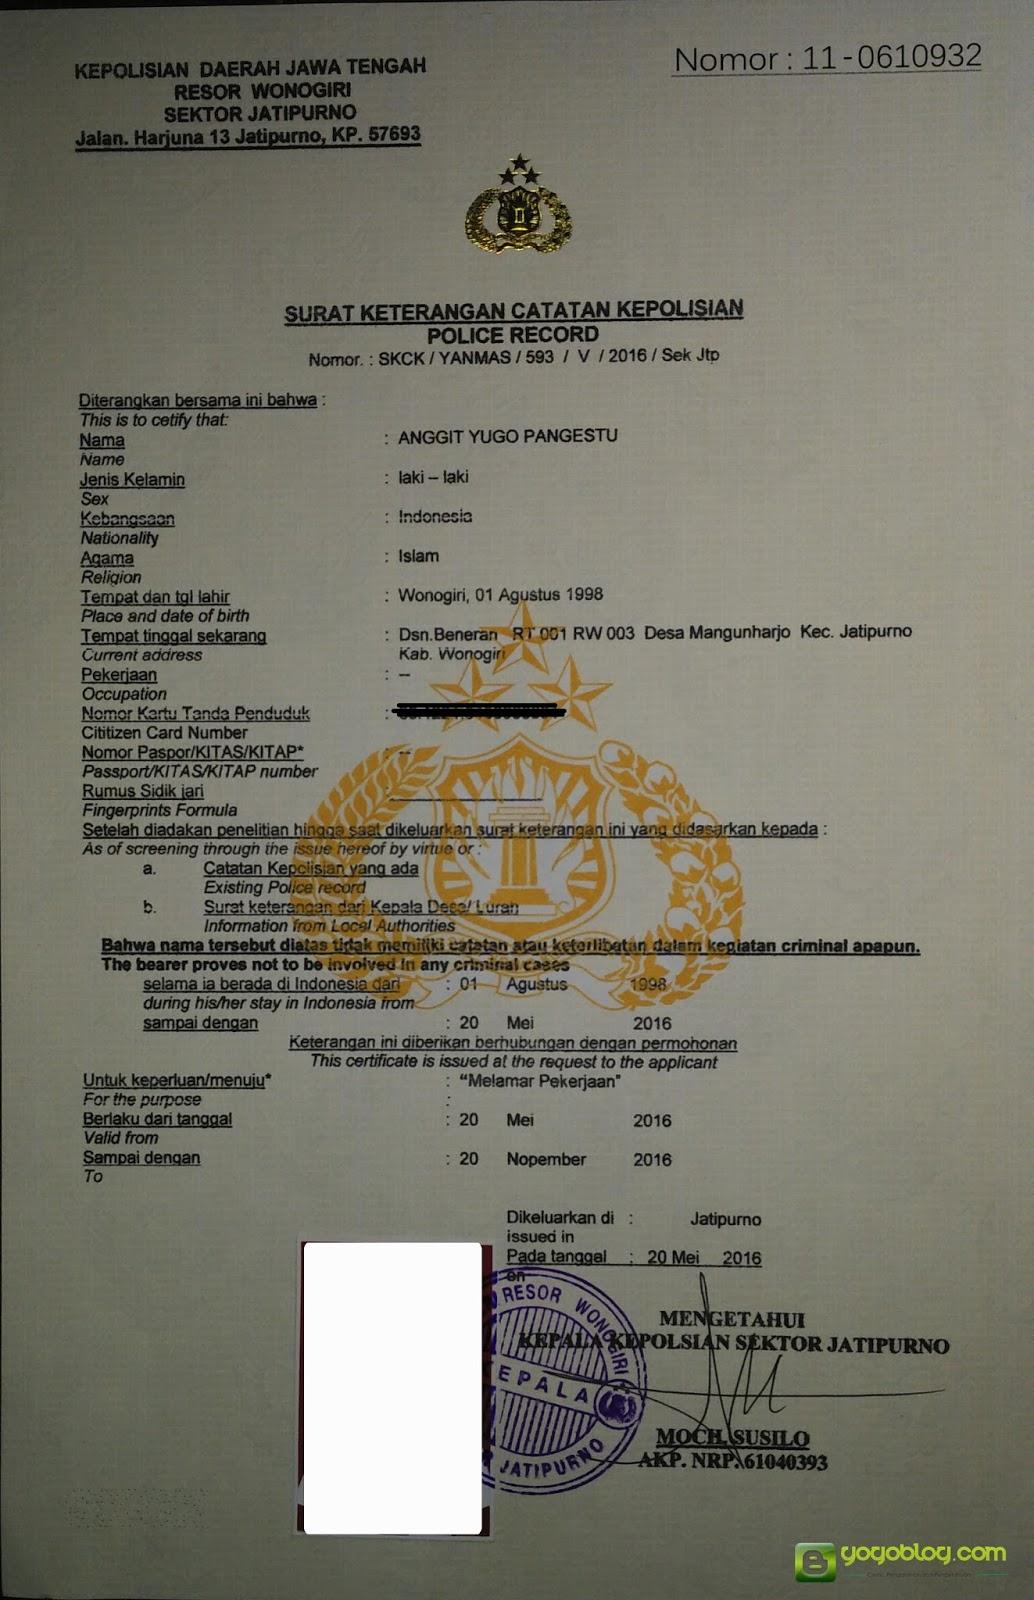 Tampak Surat Keterangan Catatan Kepolisian